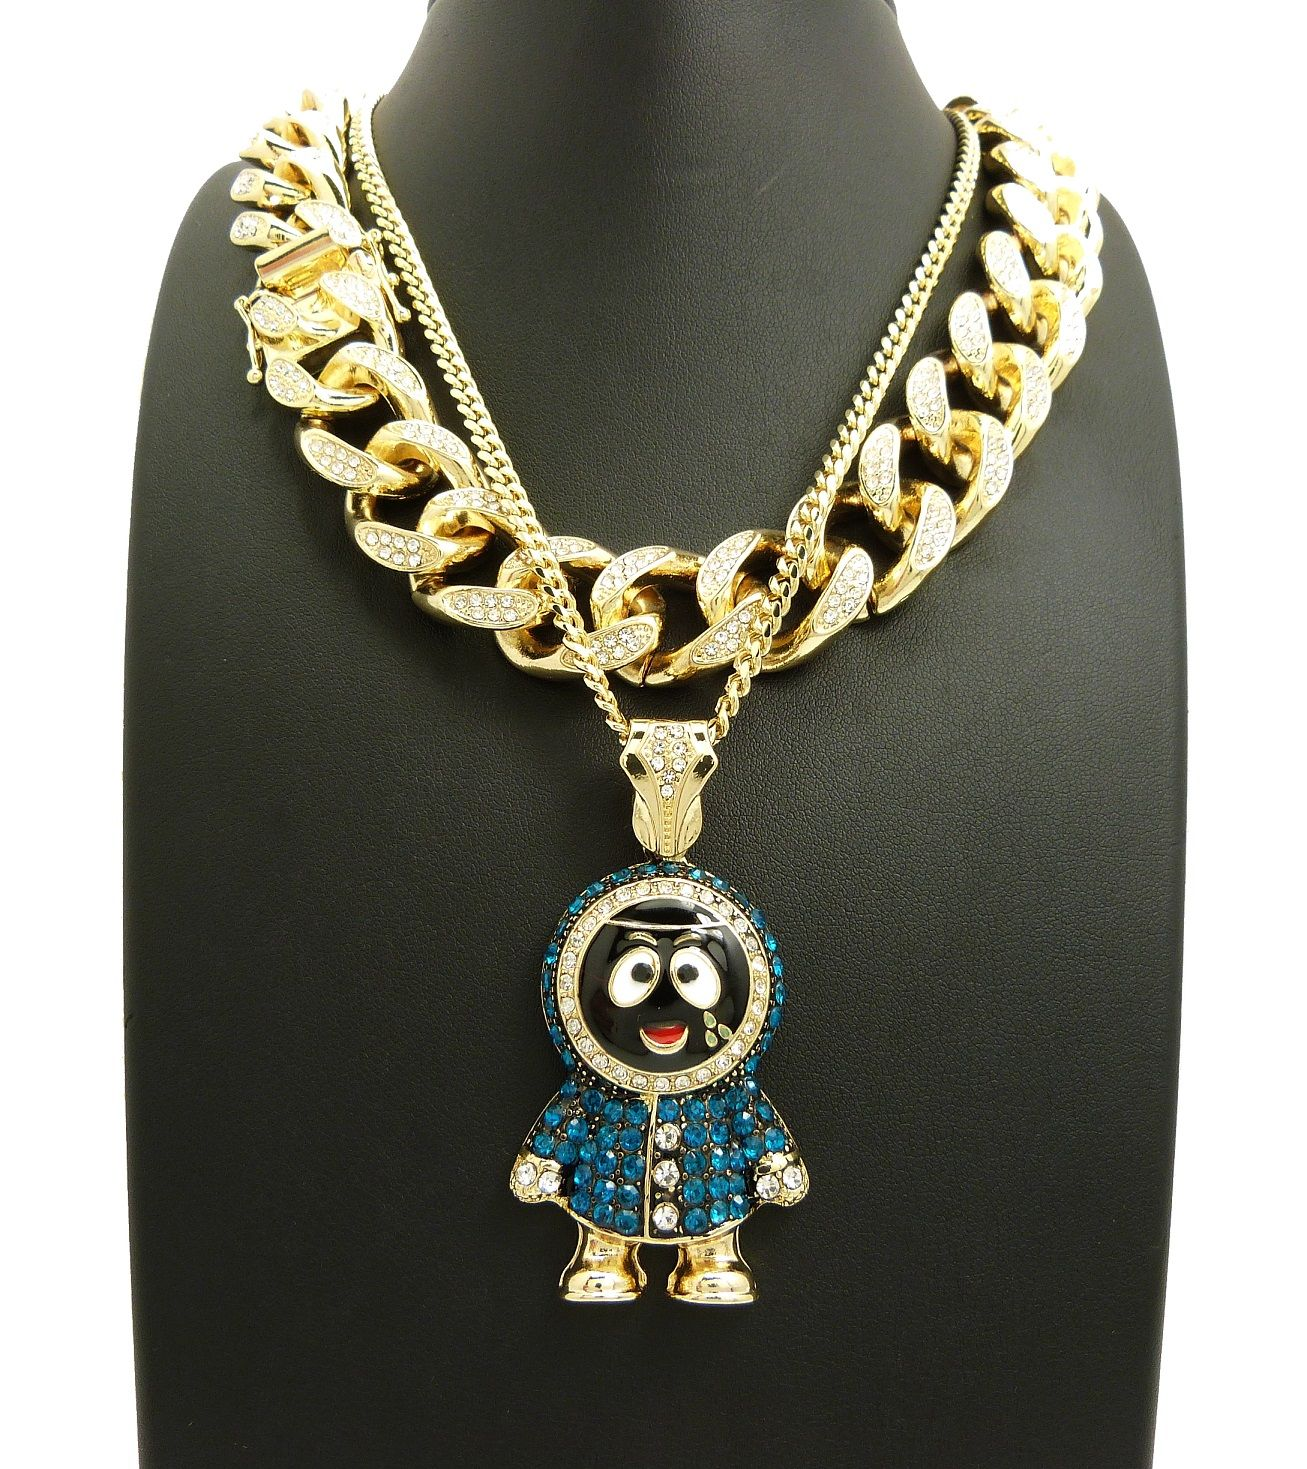 Wine Jianxian Mountain Bear Cross Pendant Jewelry Zinc Alloy Prayer Necklace For Men Women With Necklace,24 Inch